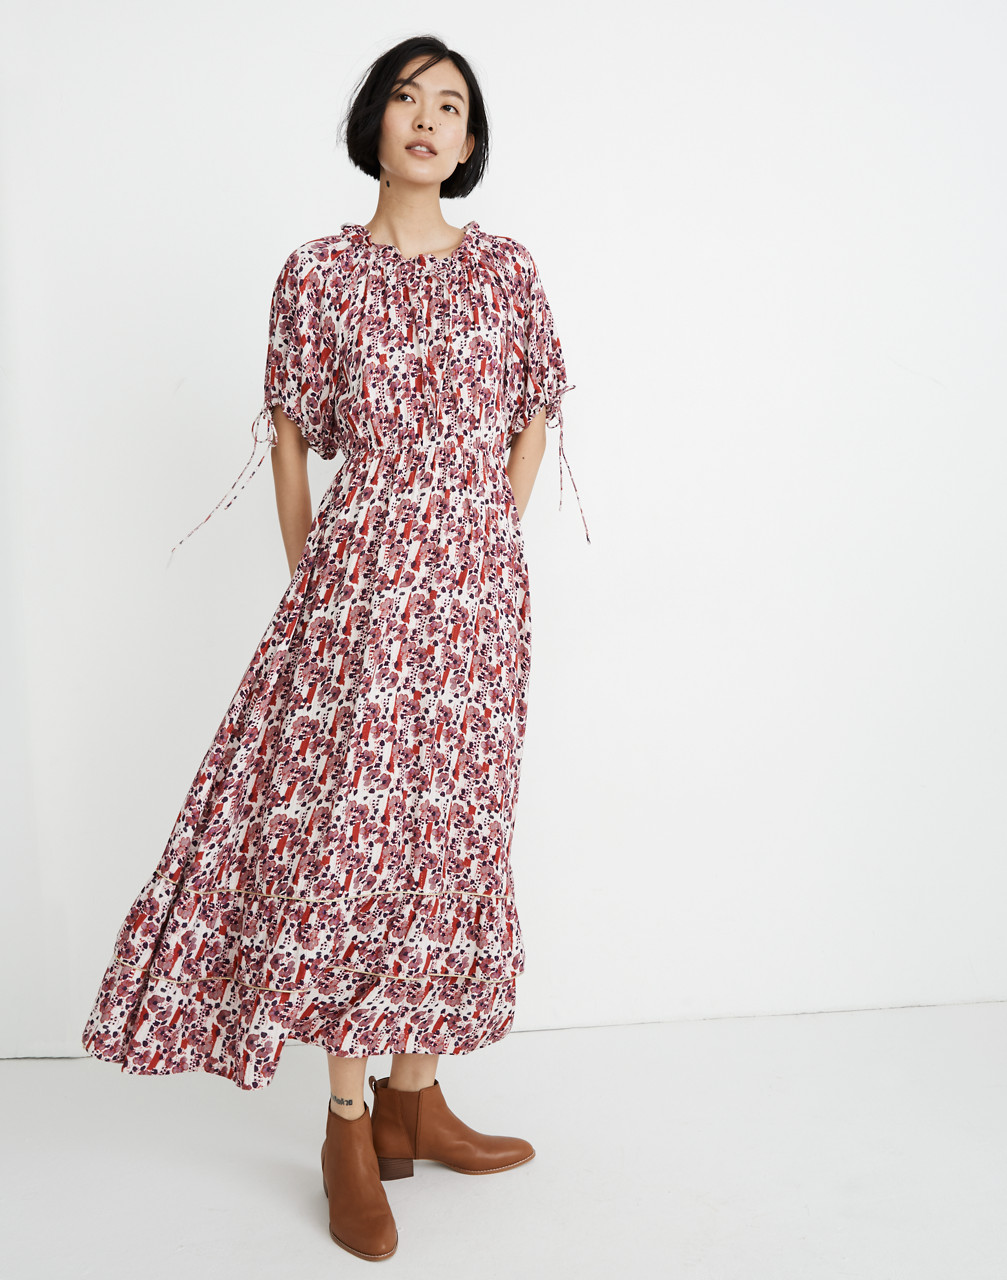 80s Dresses | Casual to Party Dresses Warm Geranium Maxi Dress $199.99 AT vintagedancer.com